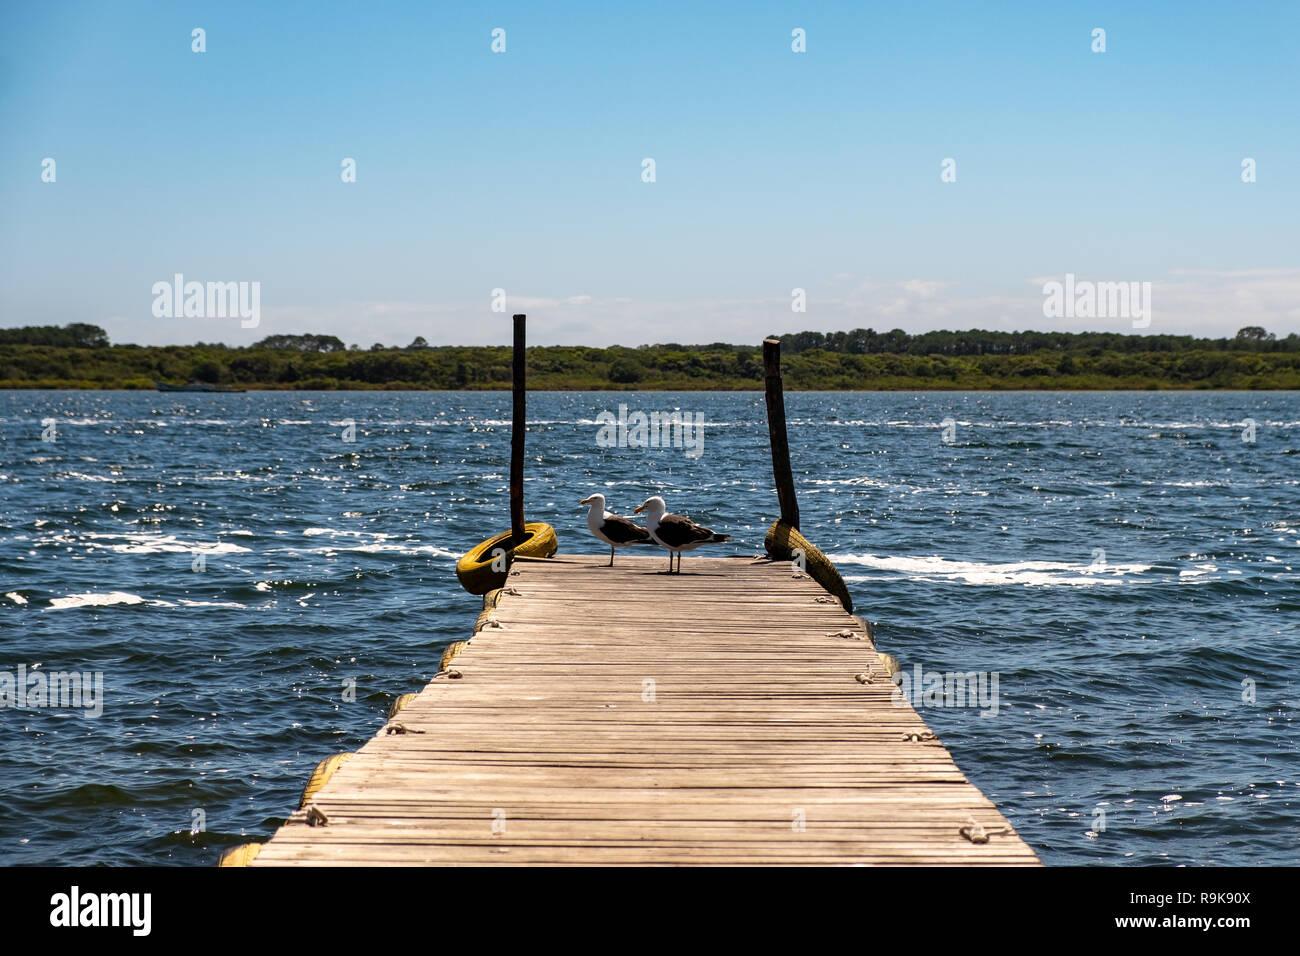 Two black an white birds landing on a outdoor wooden little pier at the blue lagoon.  Lagoa da Conceição, Florianópolis, Santa Catarina State, Brazil. - Stock Image